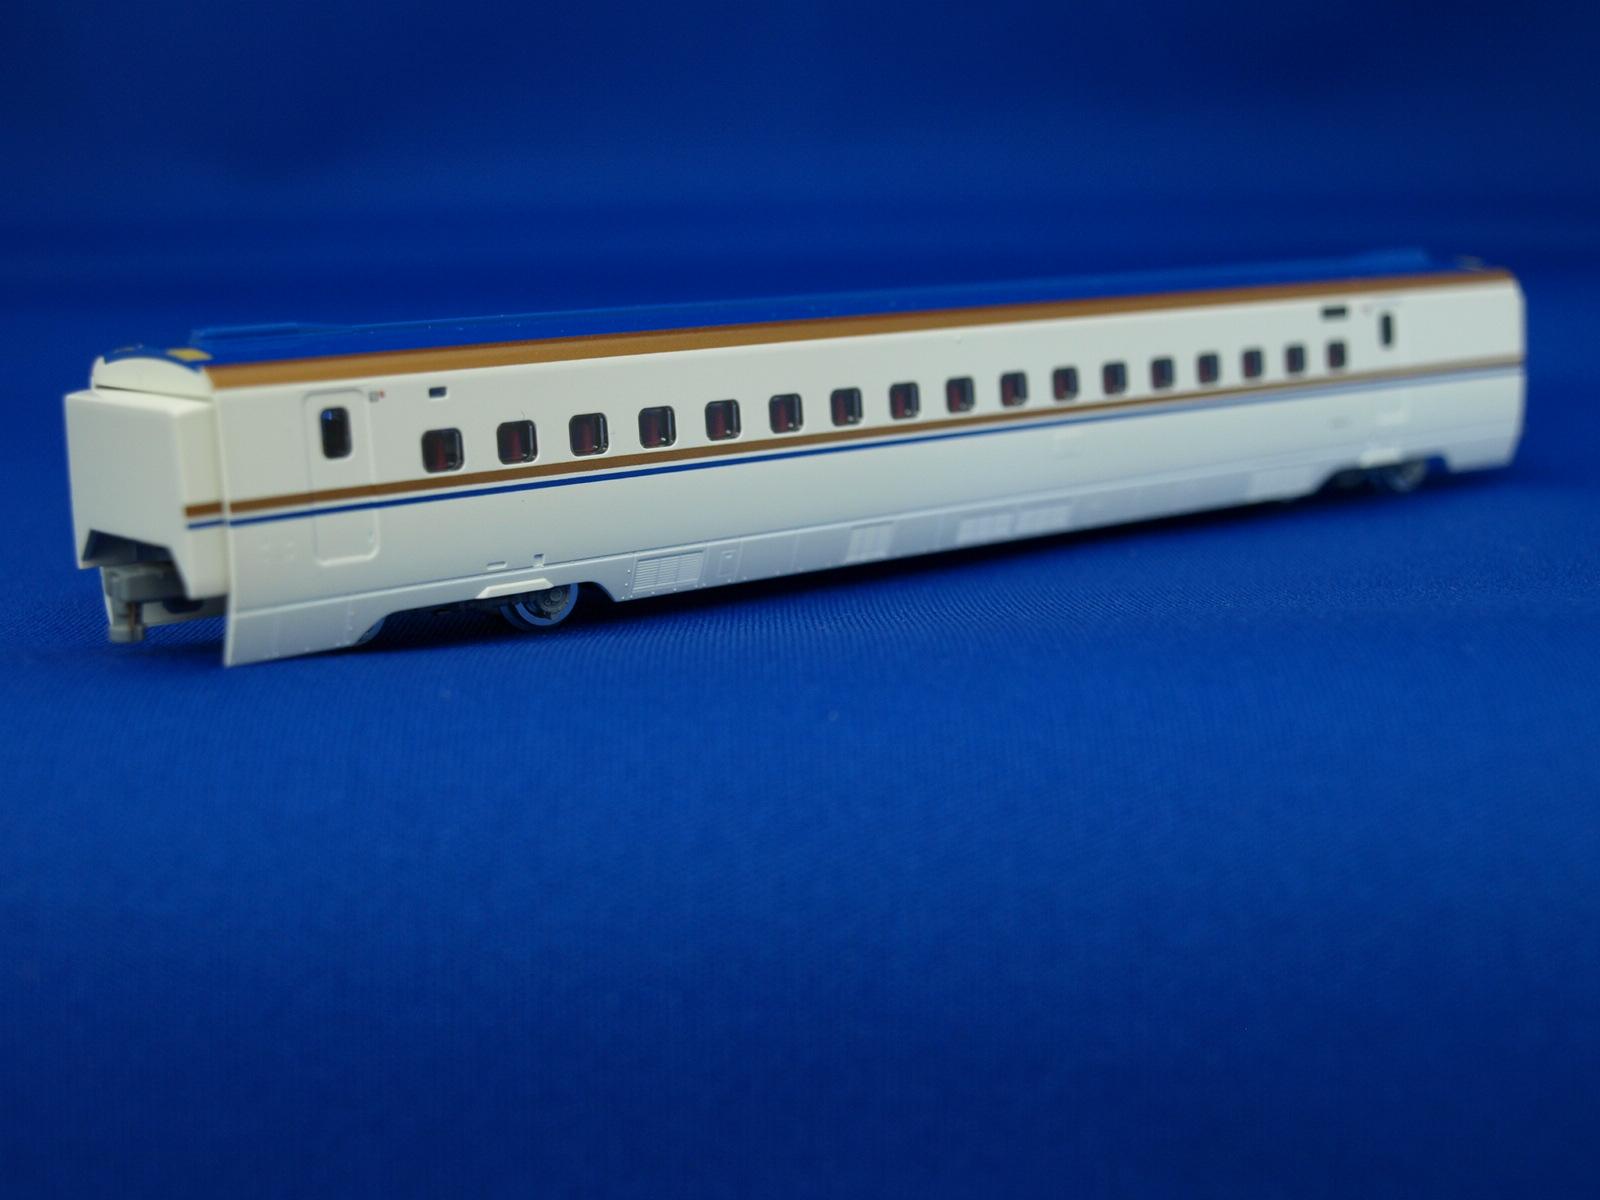 Nゲージ トミックス 92547 JR W7系北陸新幹線増結6両セットB